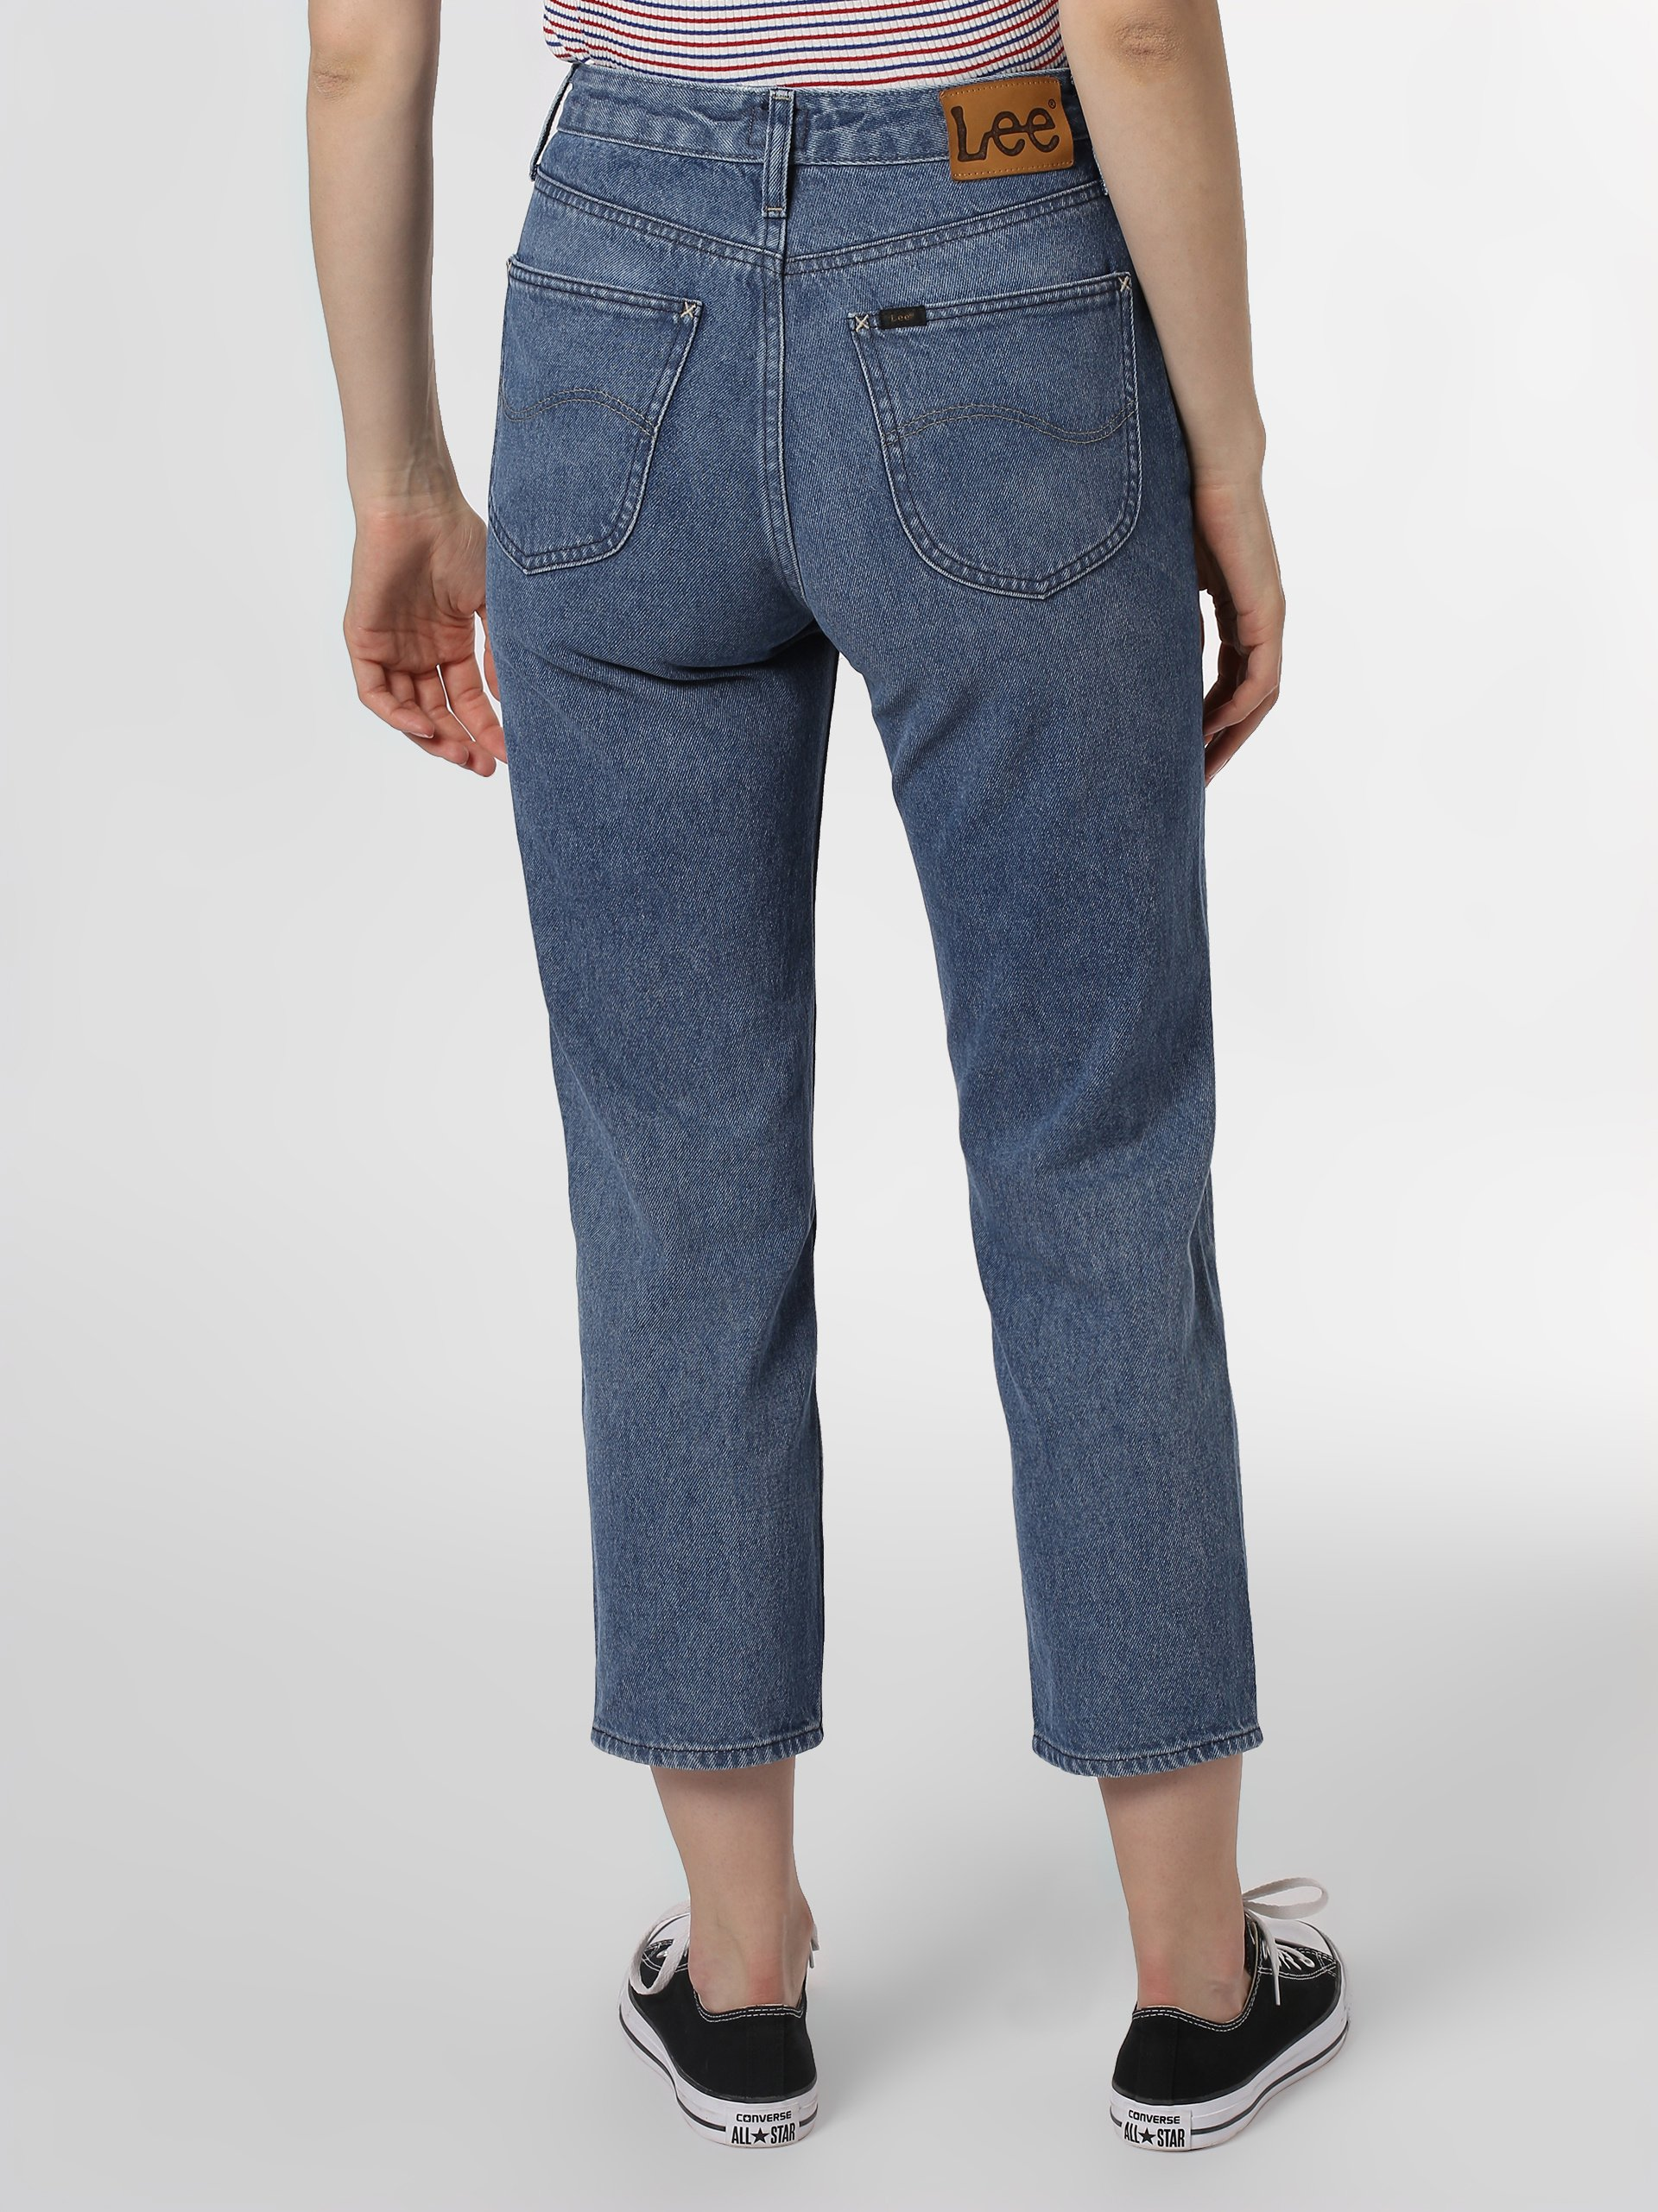 Lee Damen Jeans - Carol